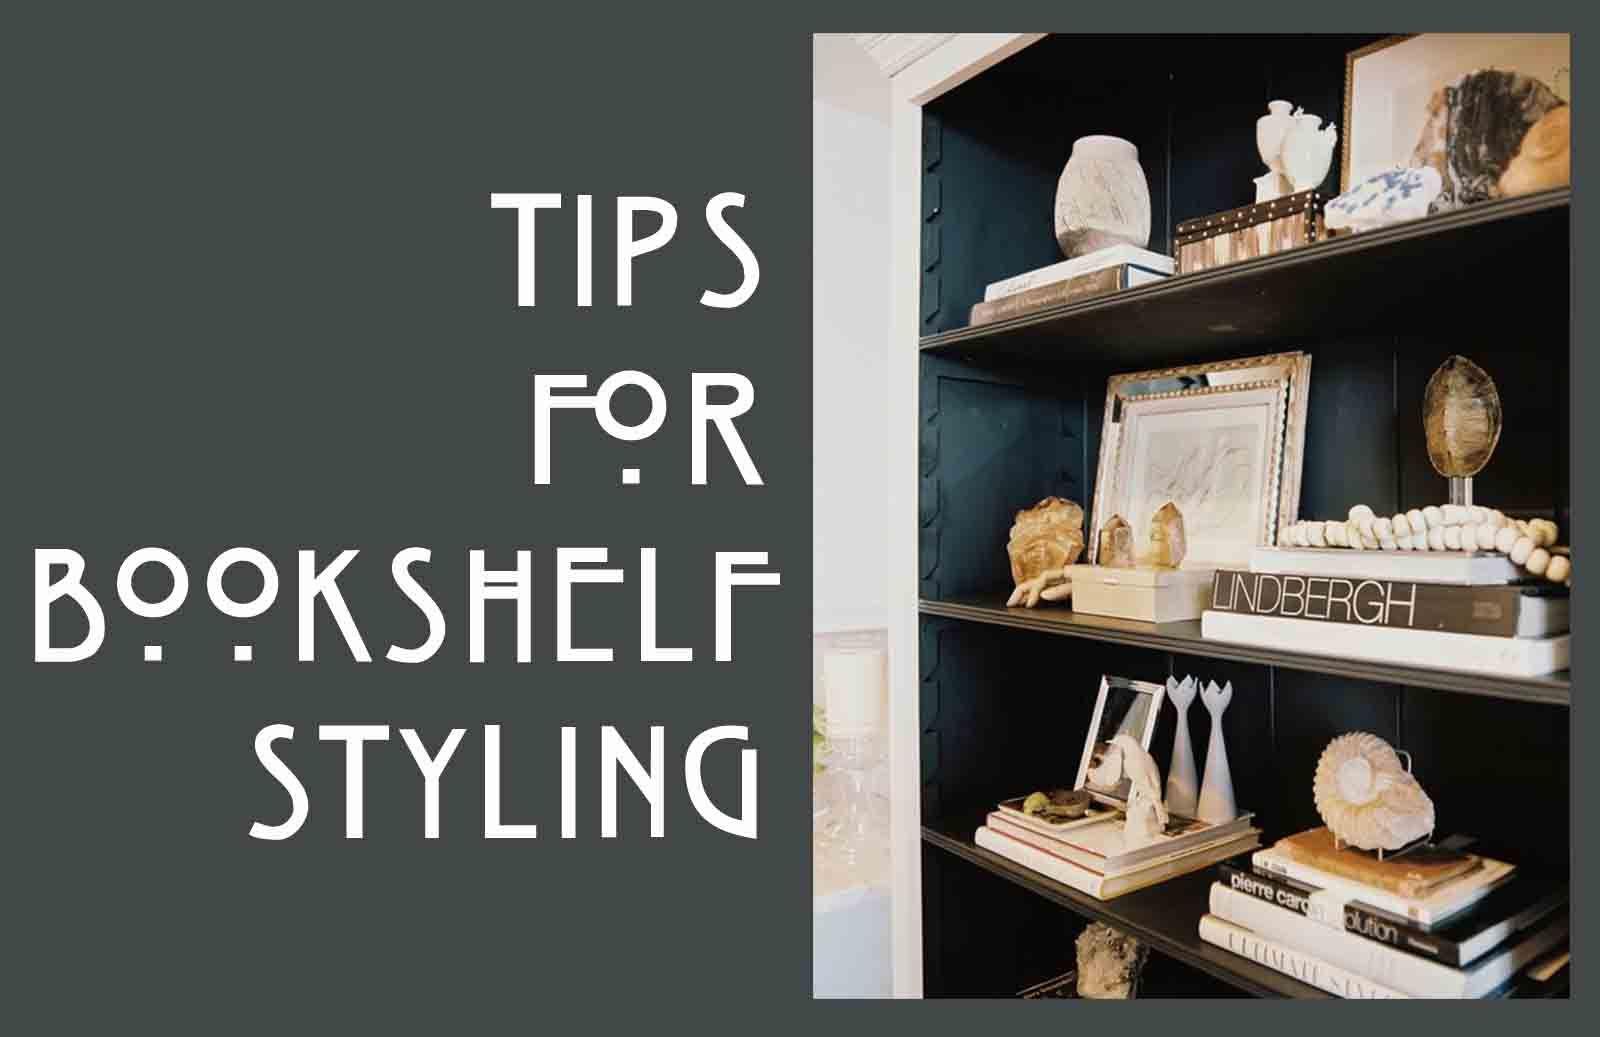 Tips for styling bookshelves | All in the Details ...